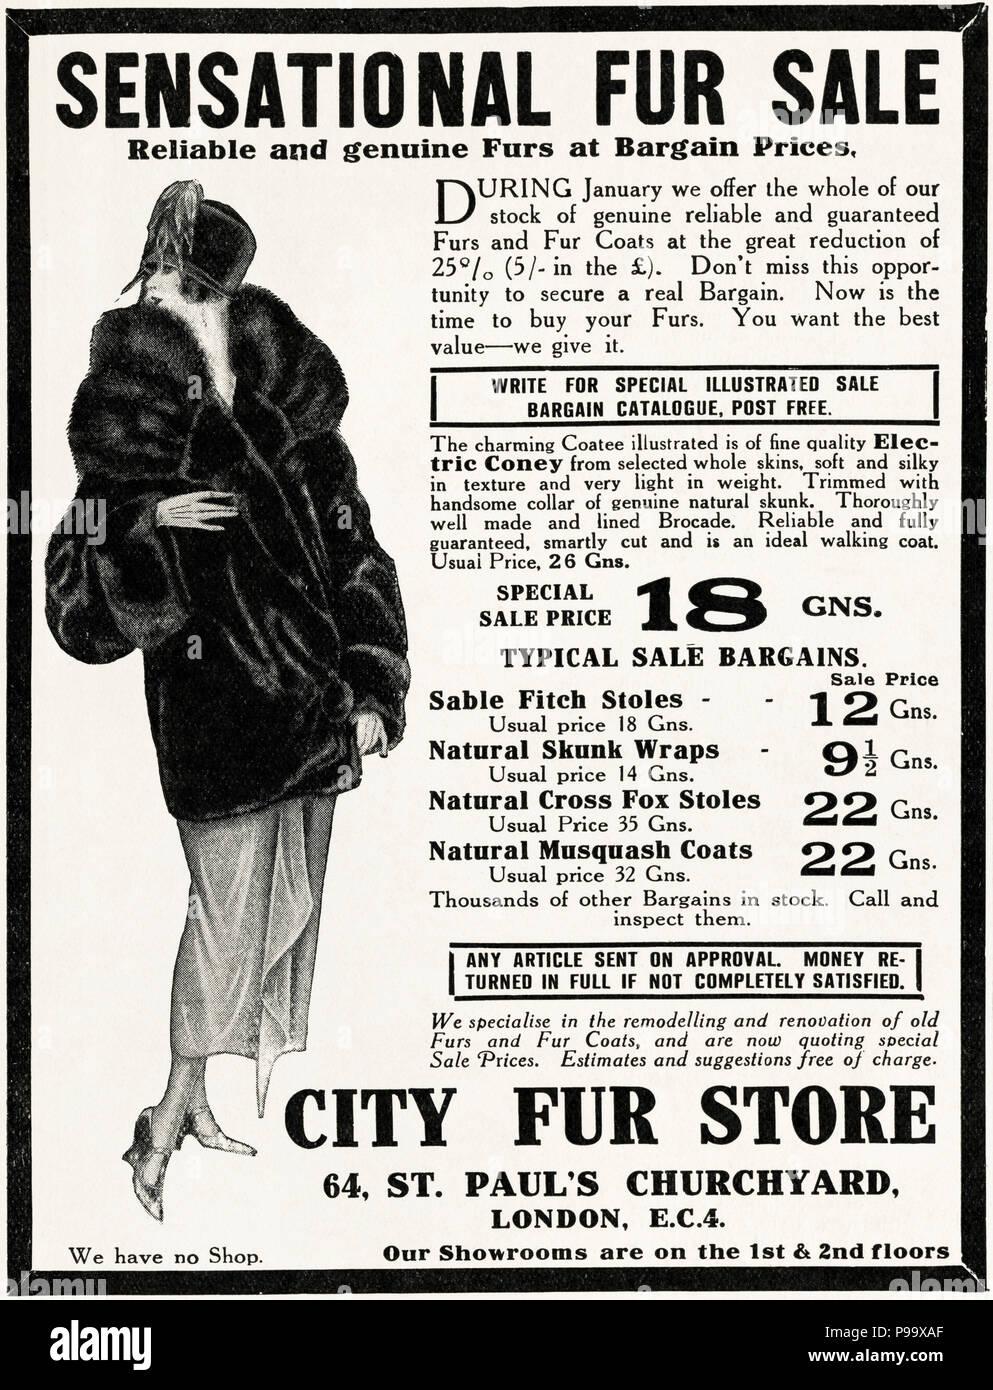 1920s old vintage original advert advertising sensational